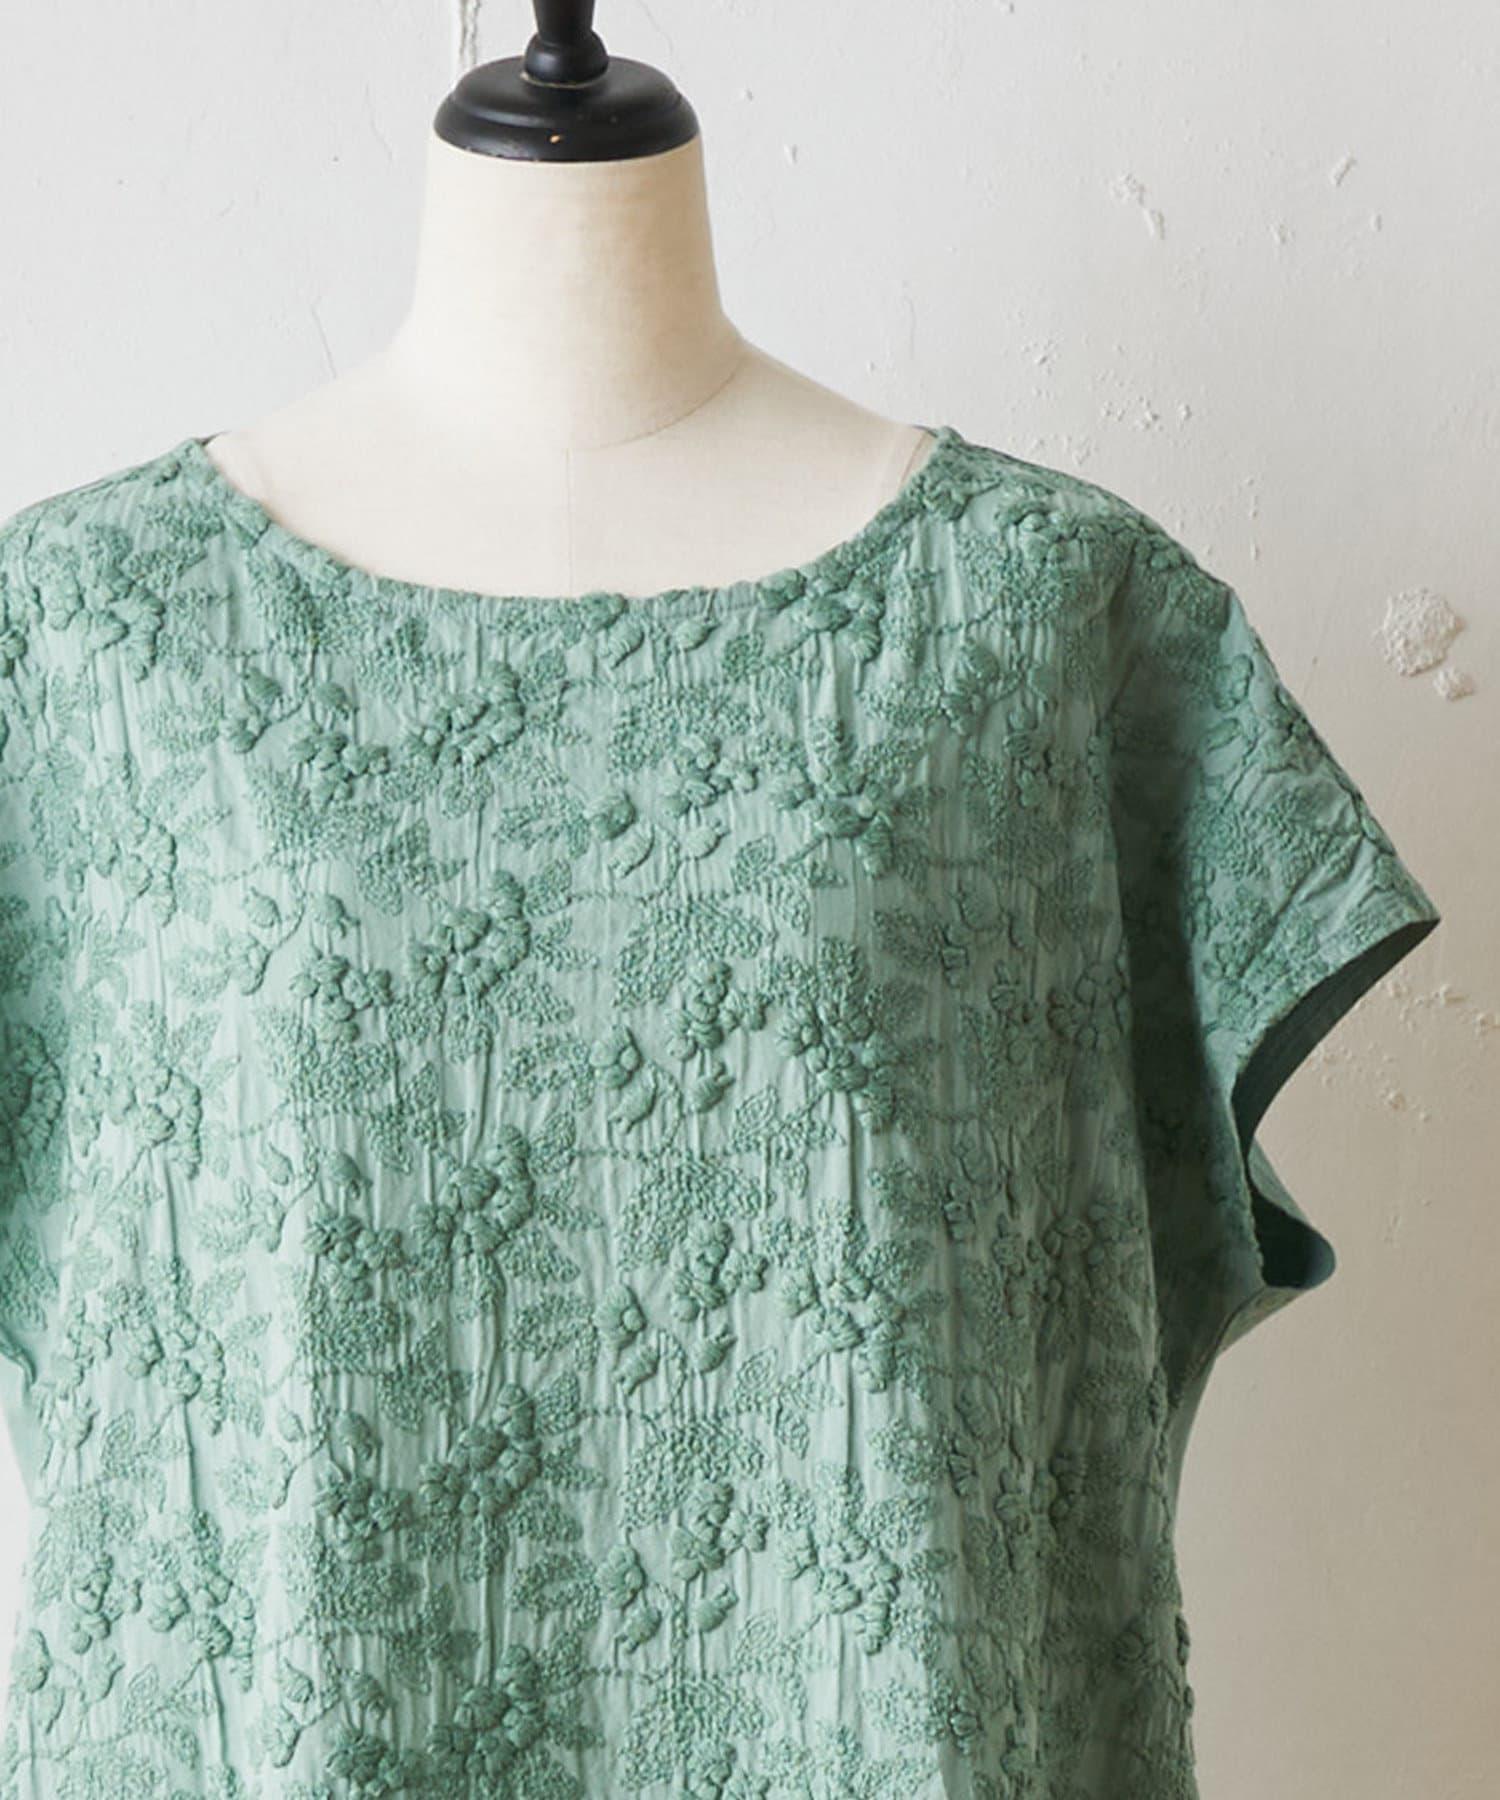 BEARDSLEY(ビアズリー) 敦賀フロント刺繍ワンピース